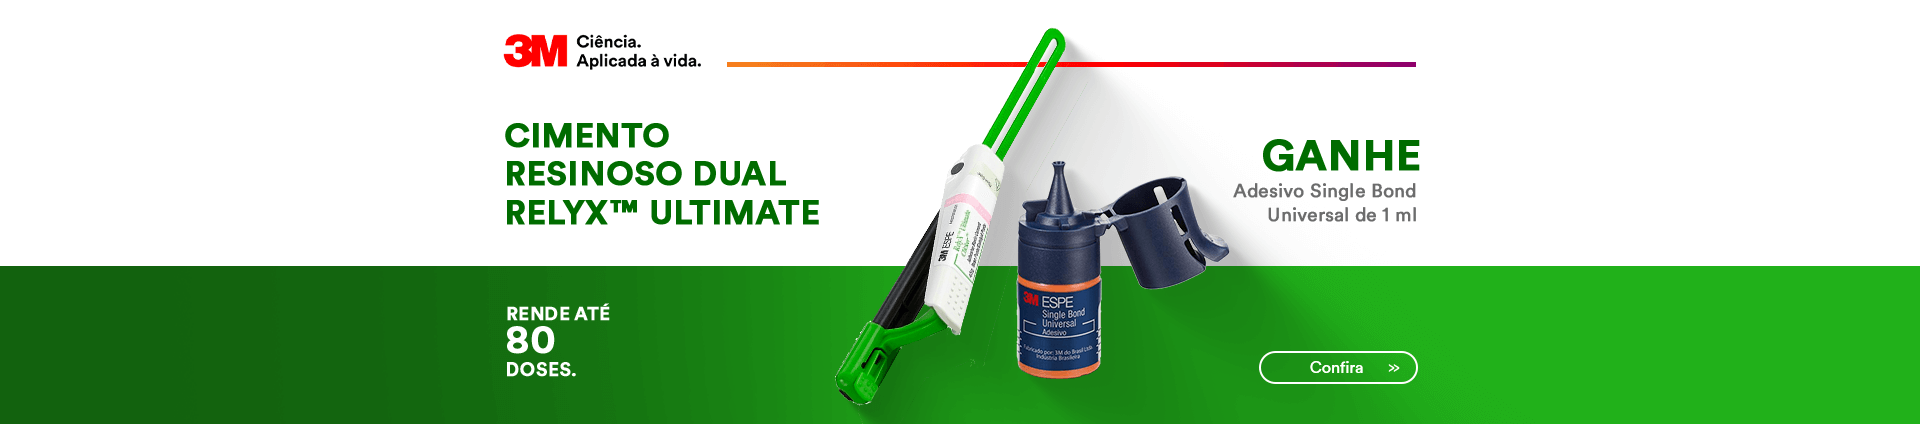 Compre Kit Cimento Resinoso RElyx Ultimate e Ganhe Adesivo Single Bond! | Dental Cremer